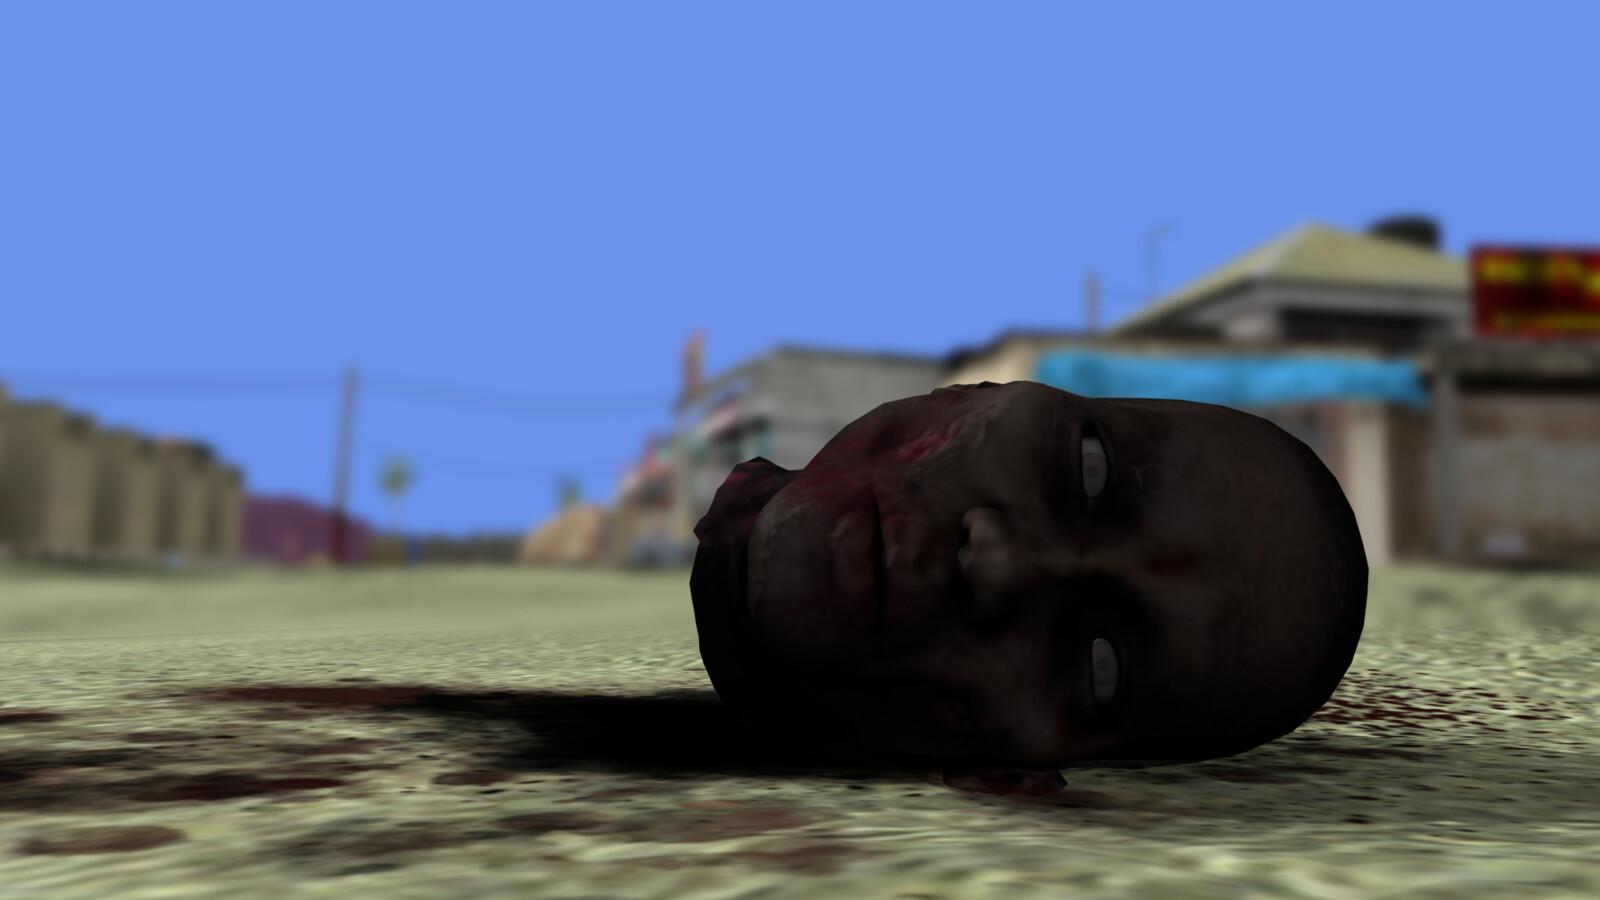 Construction zombie head